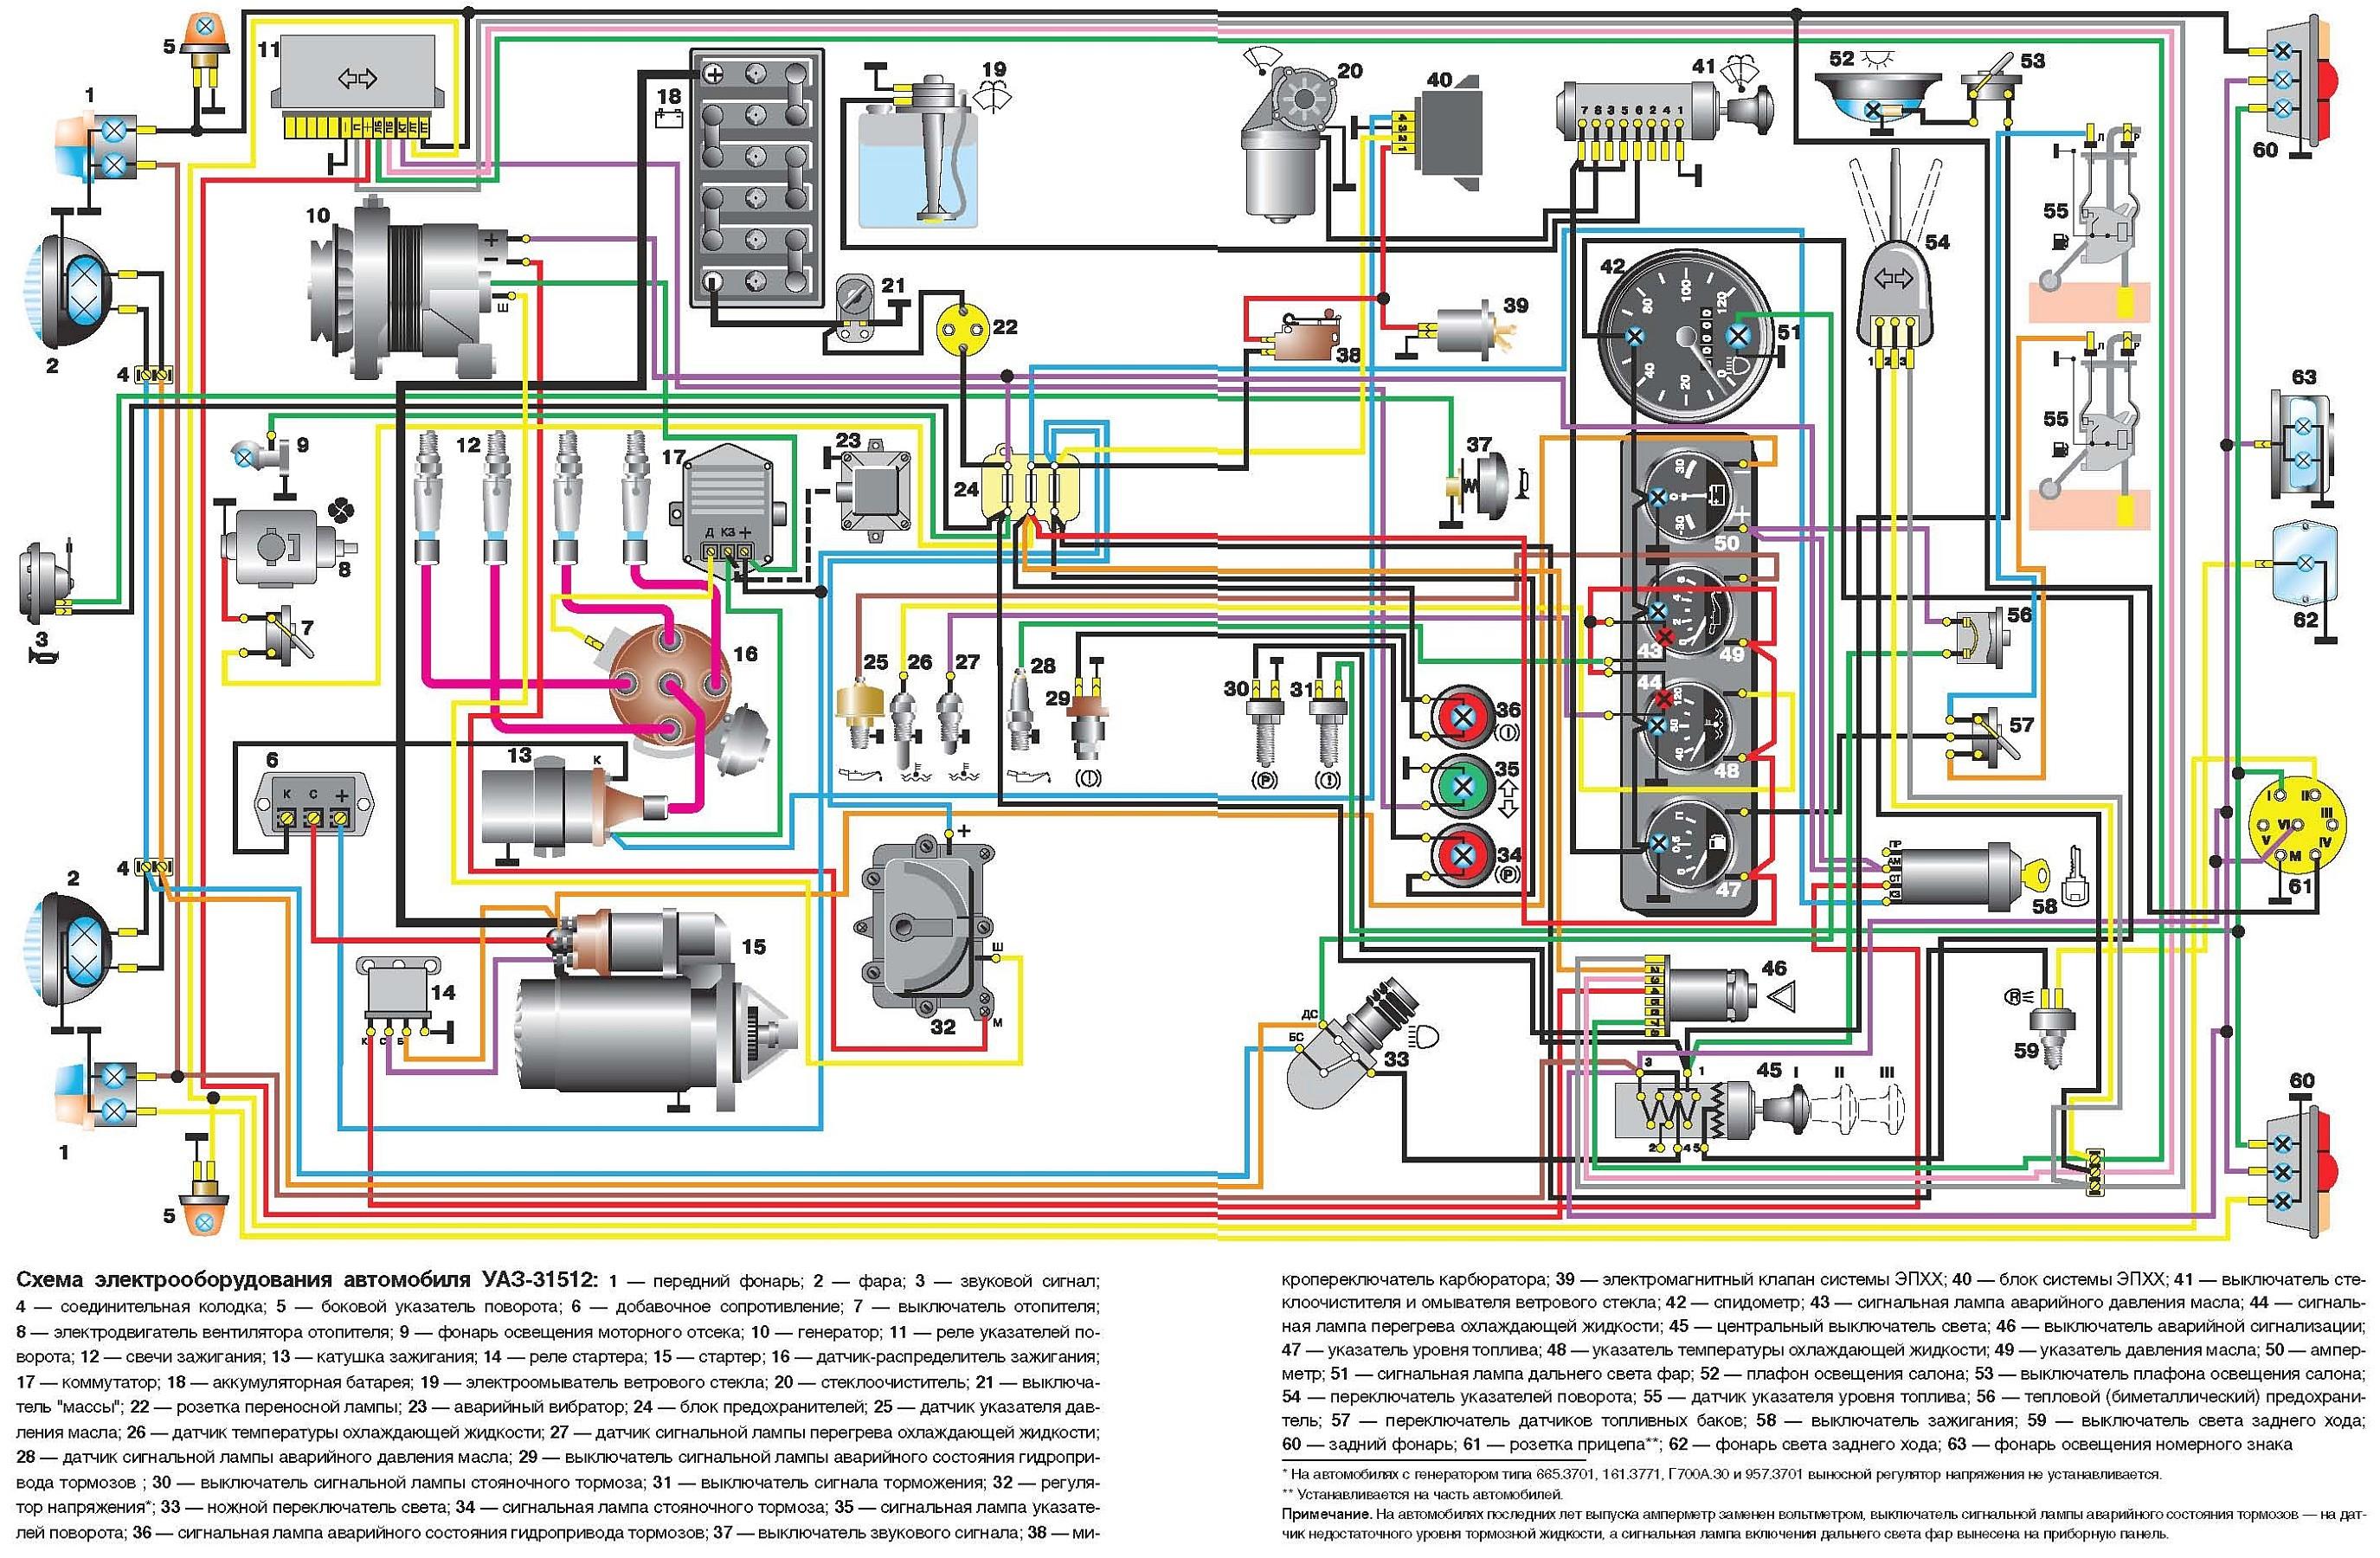 Схема электрооборудования уаз 469 фото 122